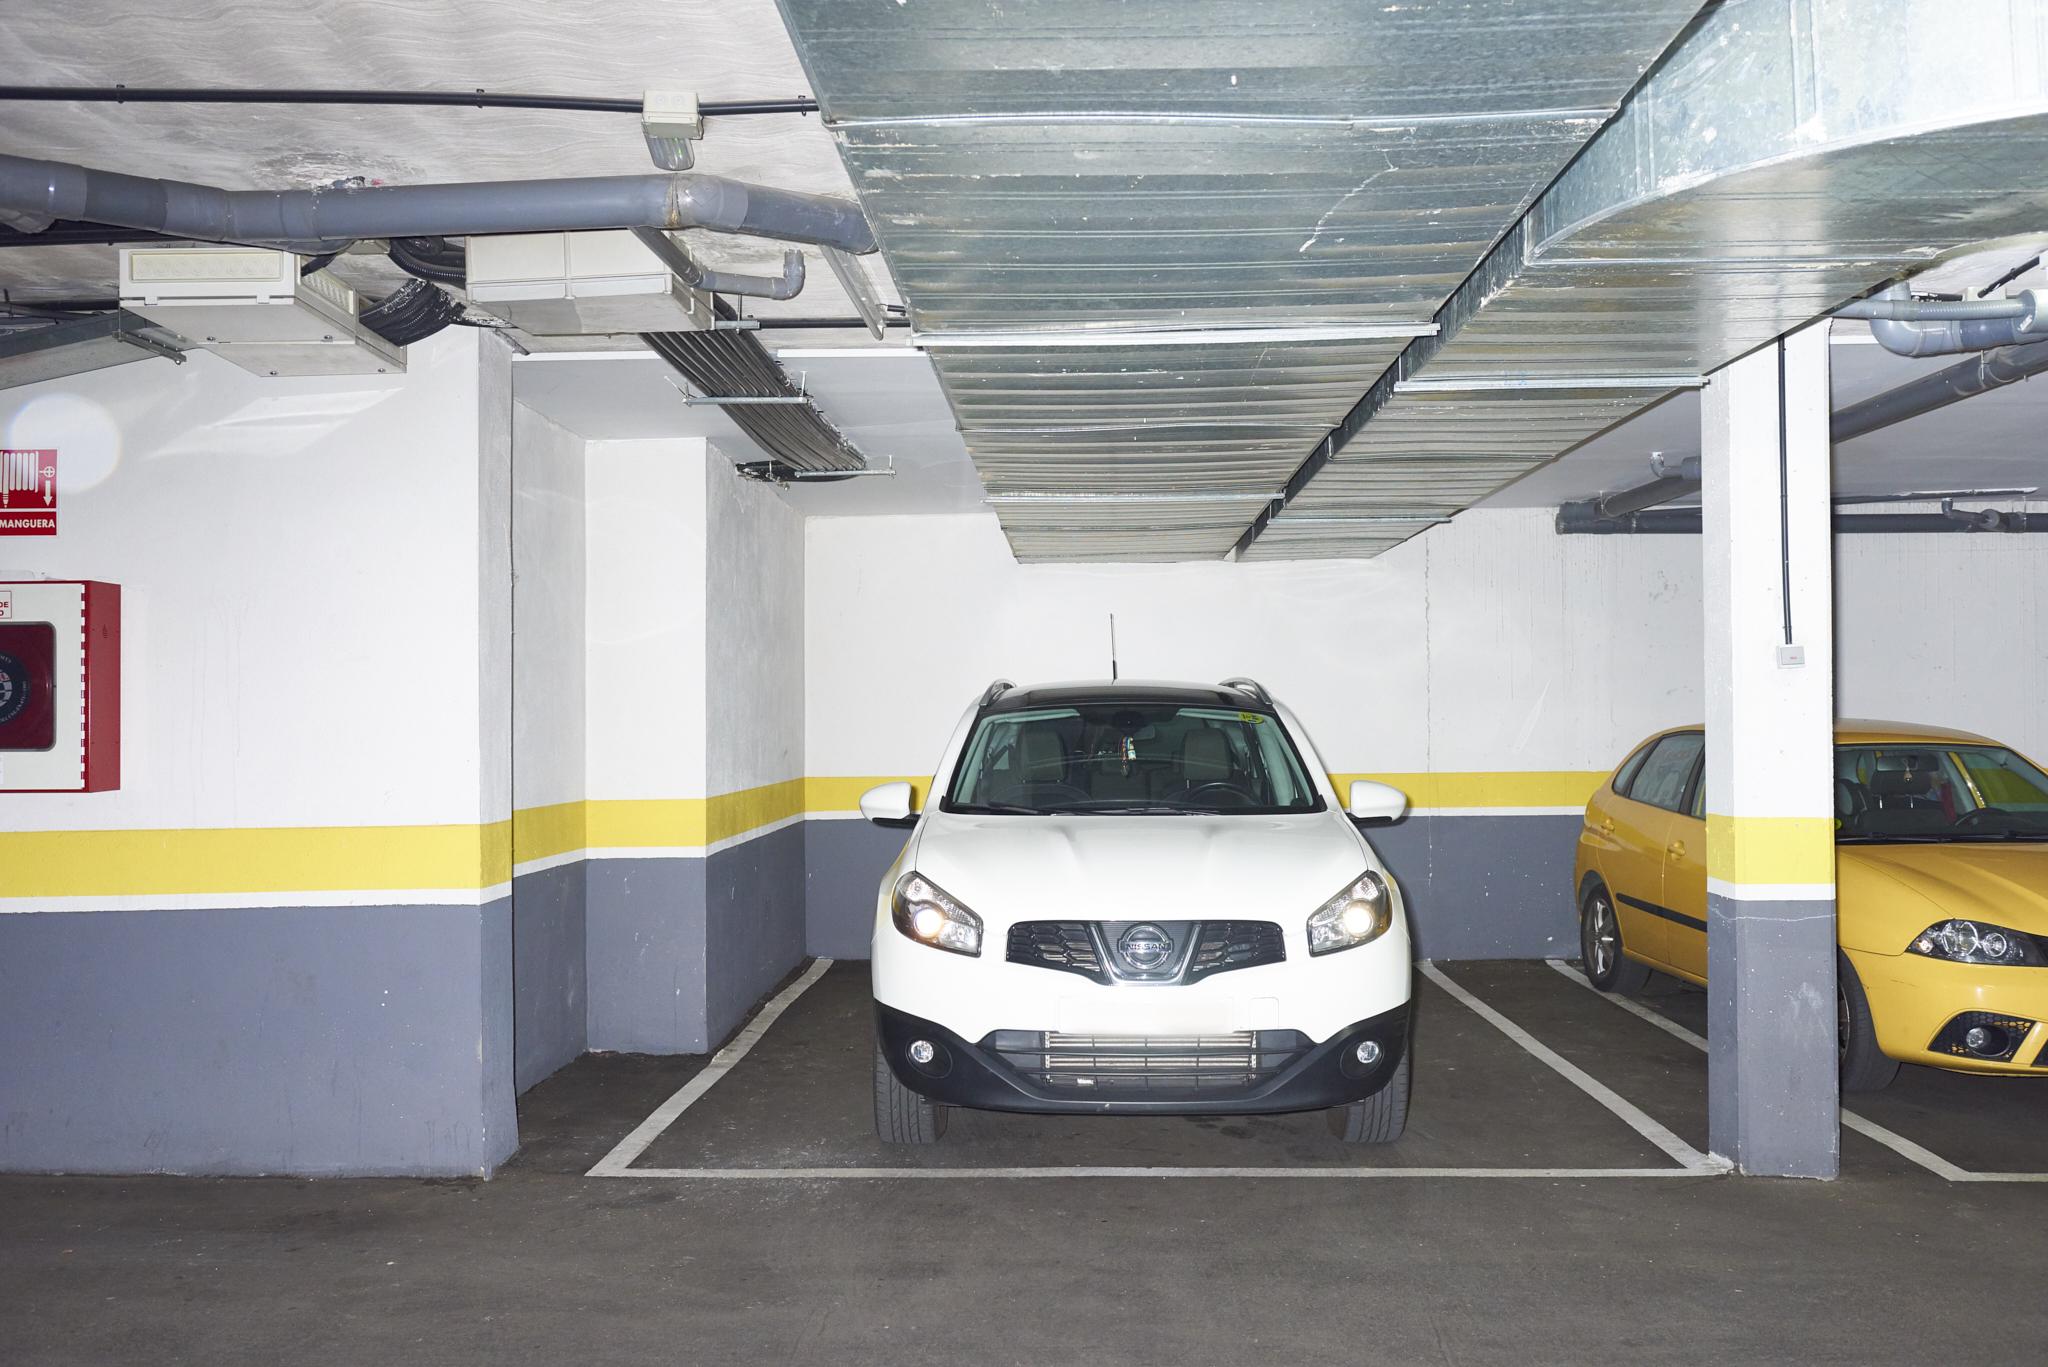 Segunda plaza de garaje